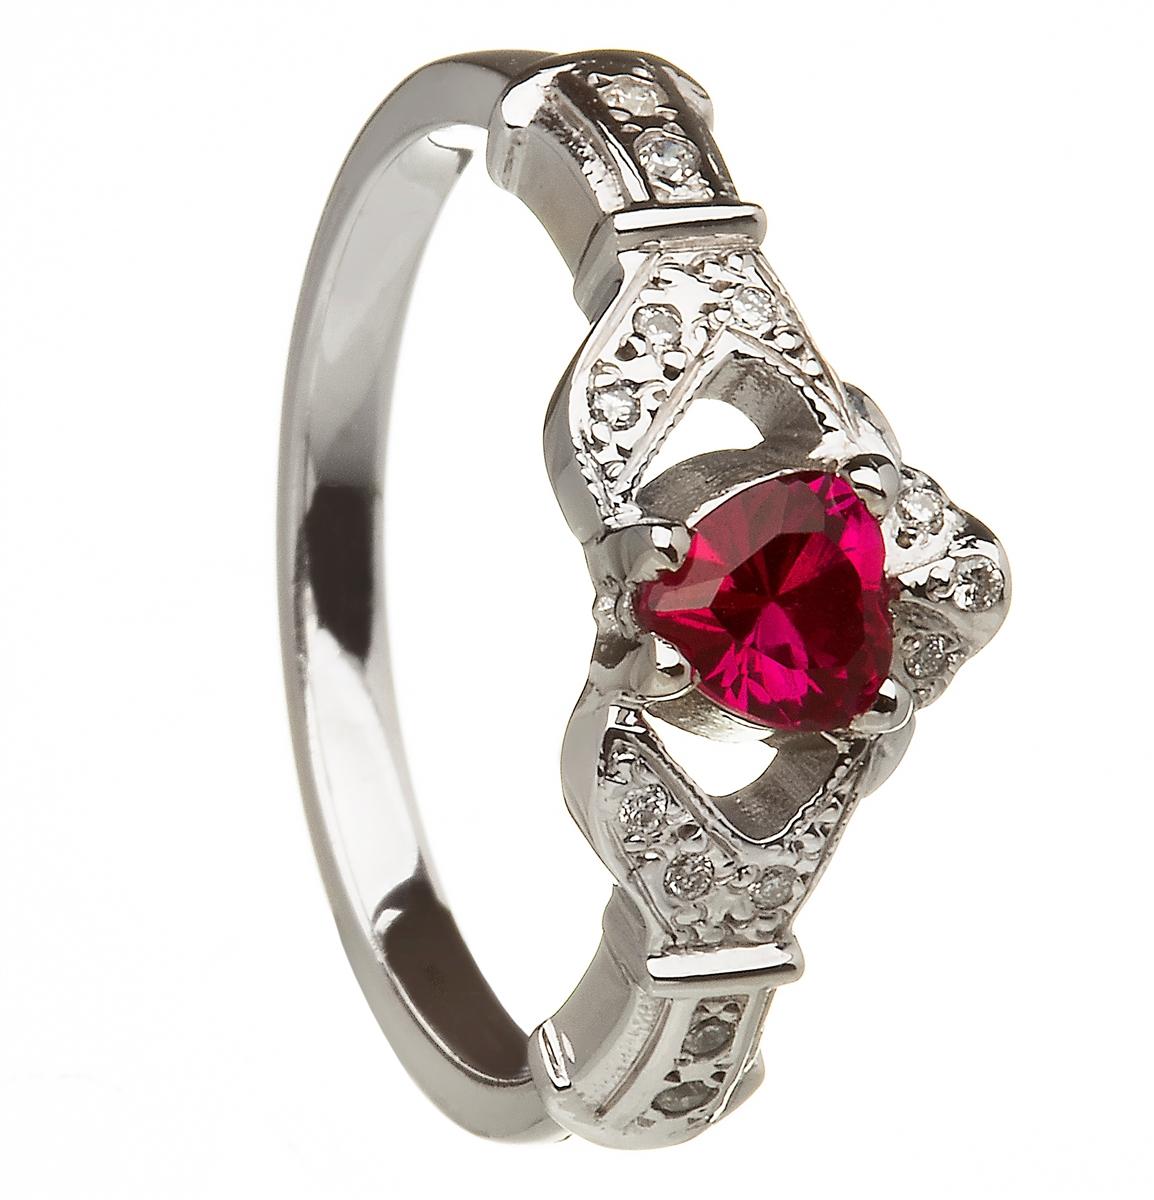 14k white gold ruby set heart claddagh ring wedding ring set - Ruby Wedding Ring Sets